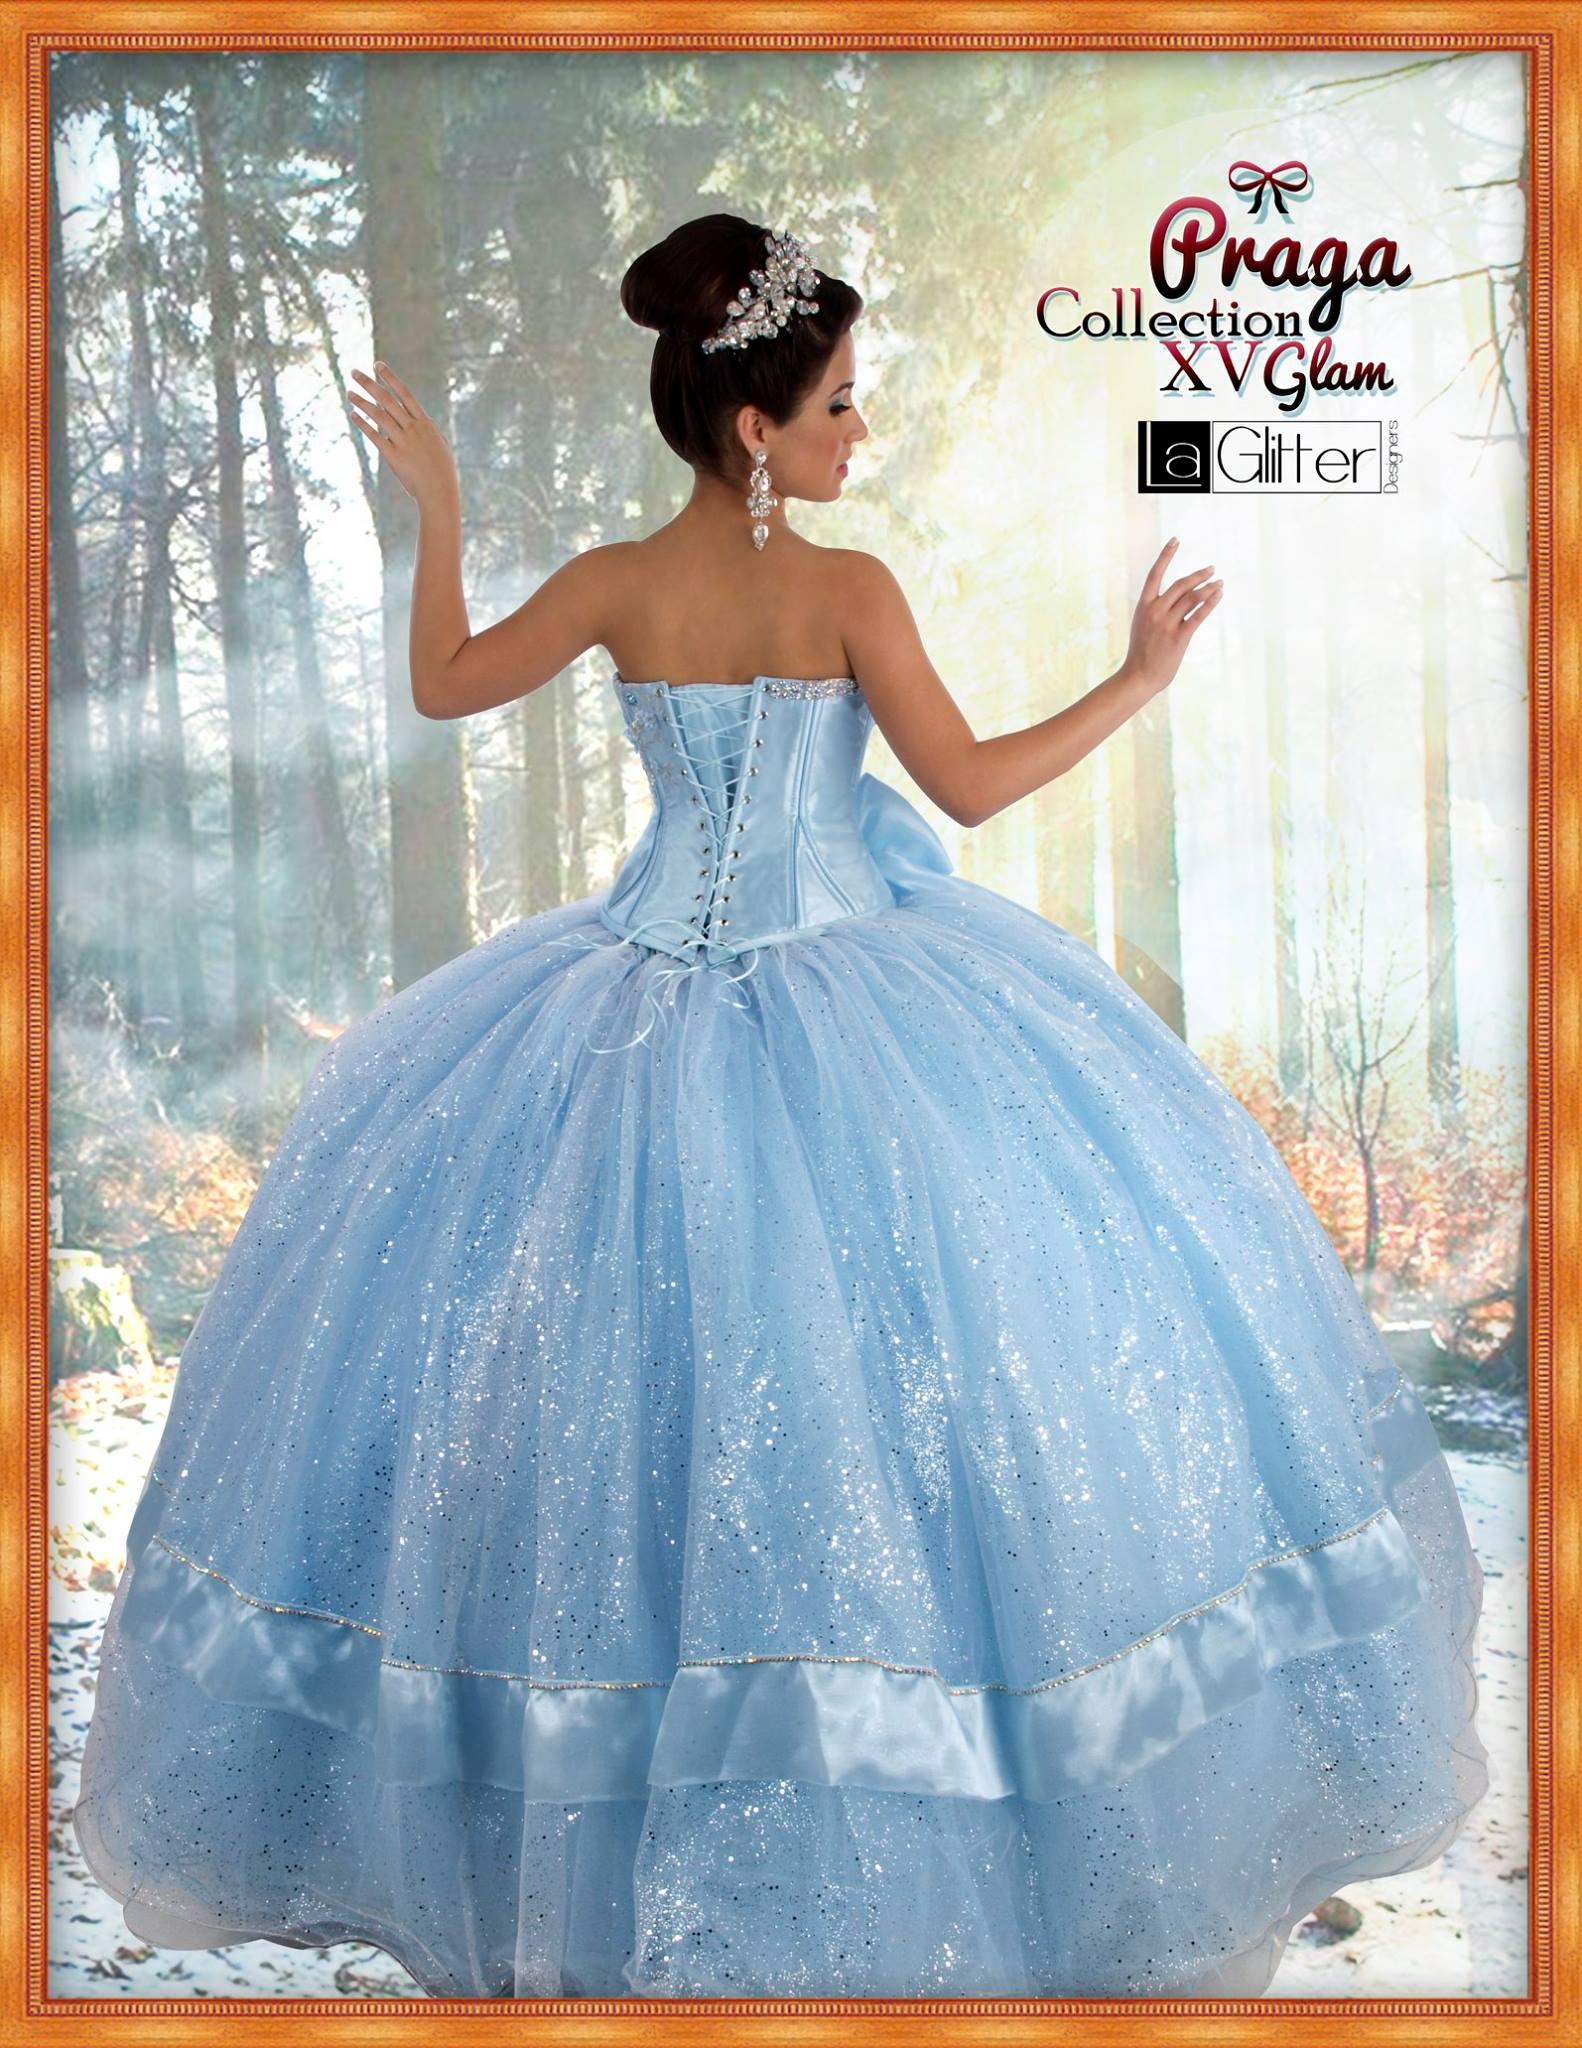 La Glitter Quinceanera Dresses | My Houston Quinceanera